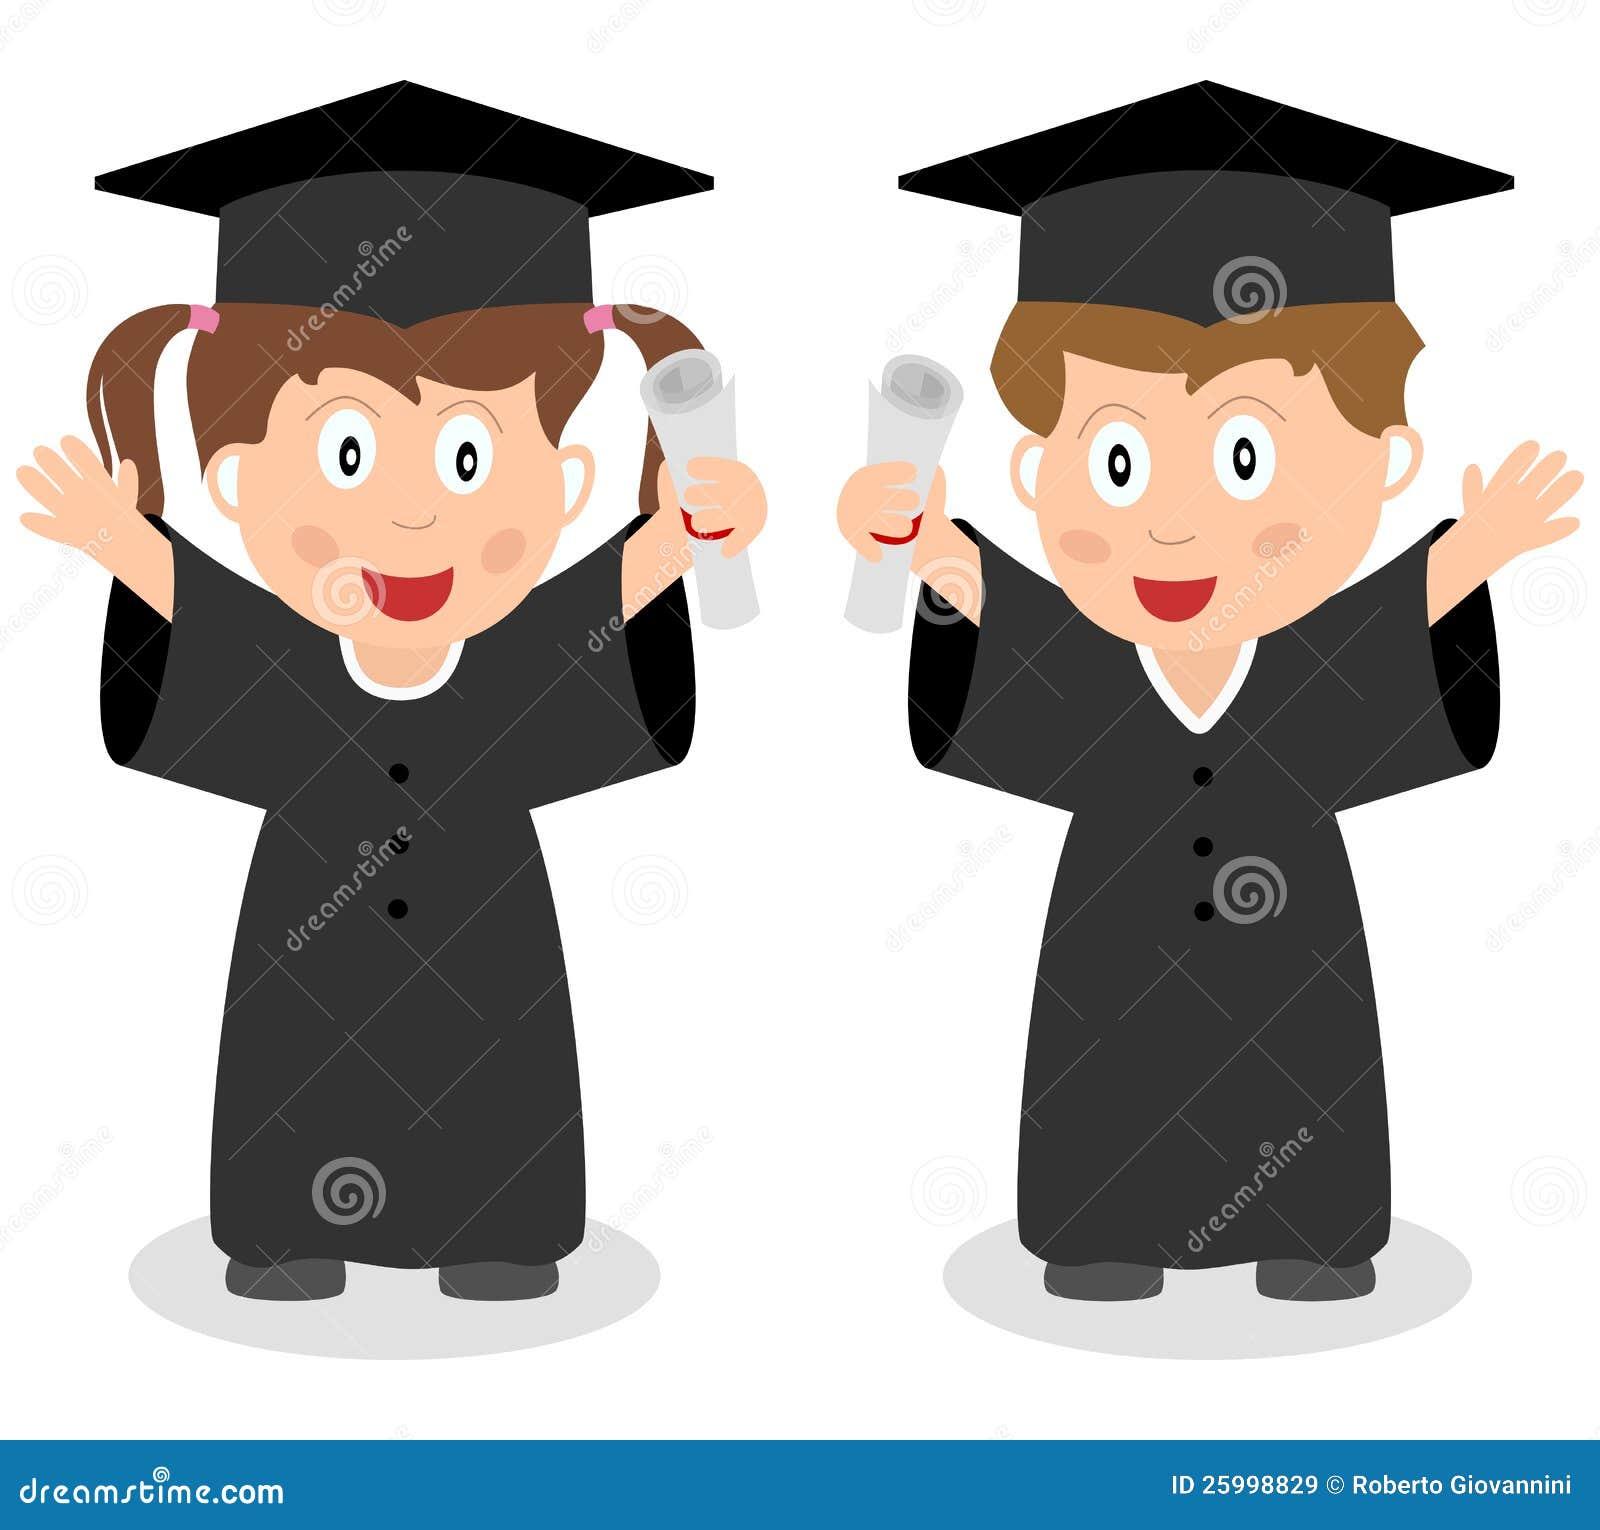 kid with graduation hat